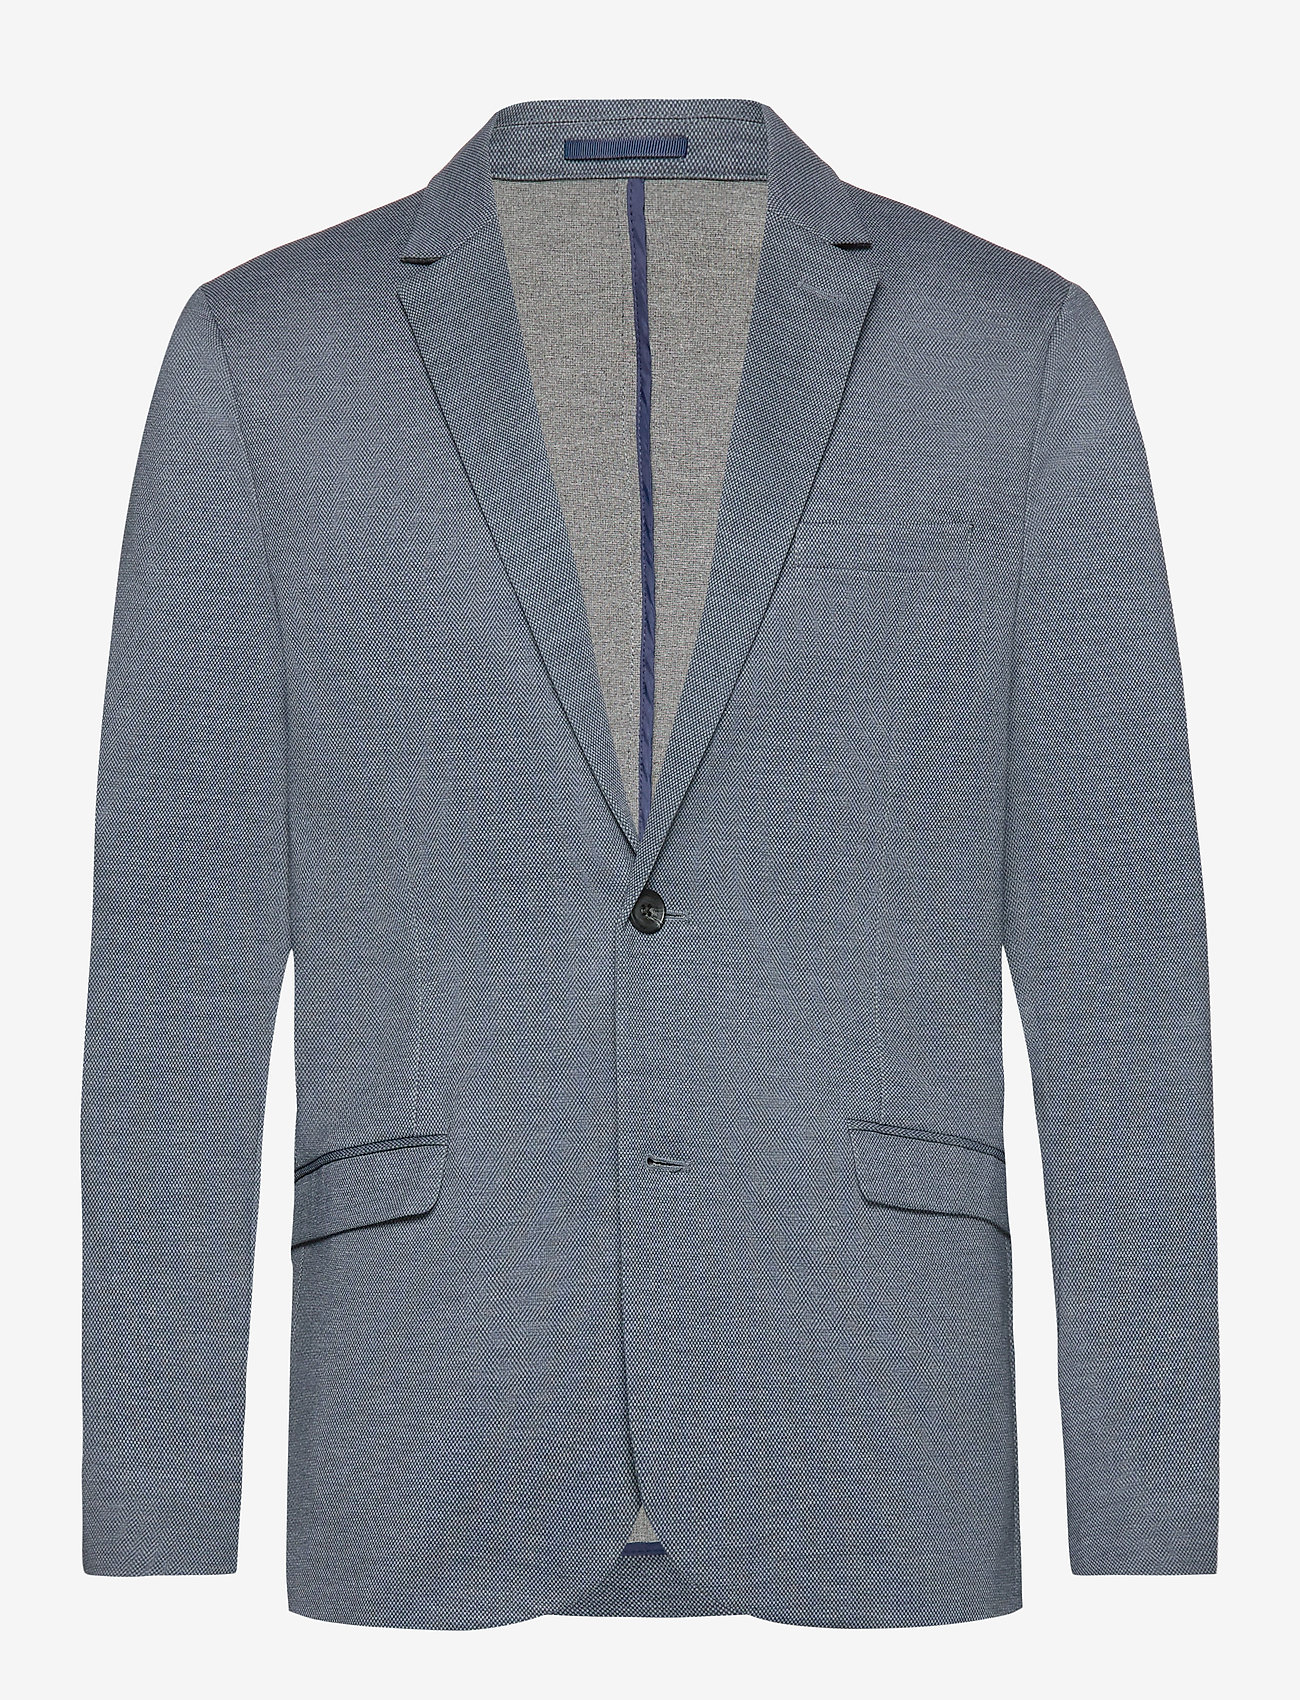 Lindbergh - Knitted blazer - yksiriviset bleiserit - grey mix - 0